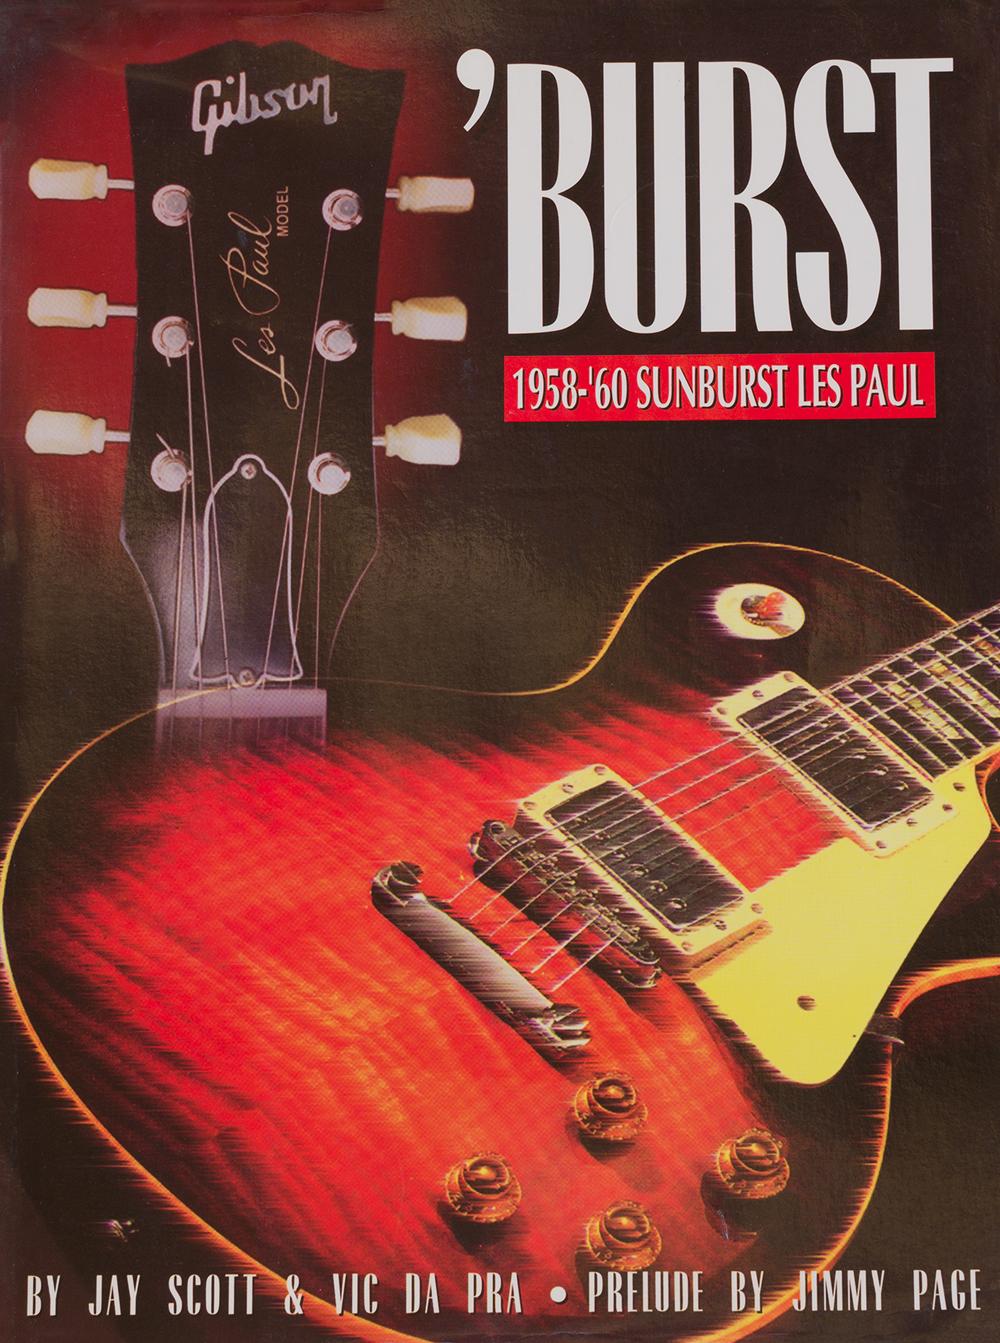 'burst, 1958-60 sunburst les paul, by vic dapra, jay scott